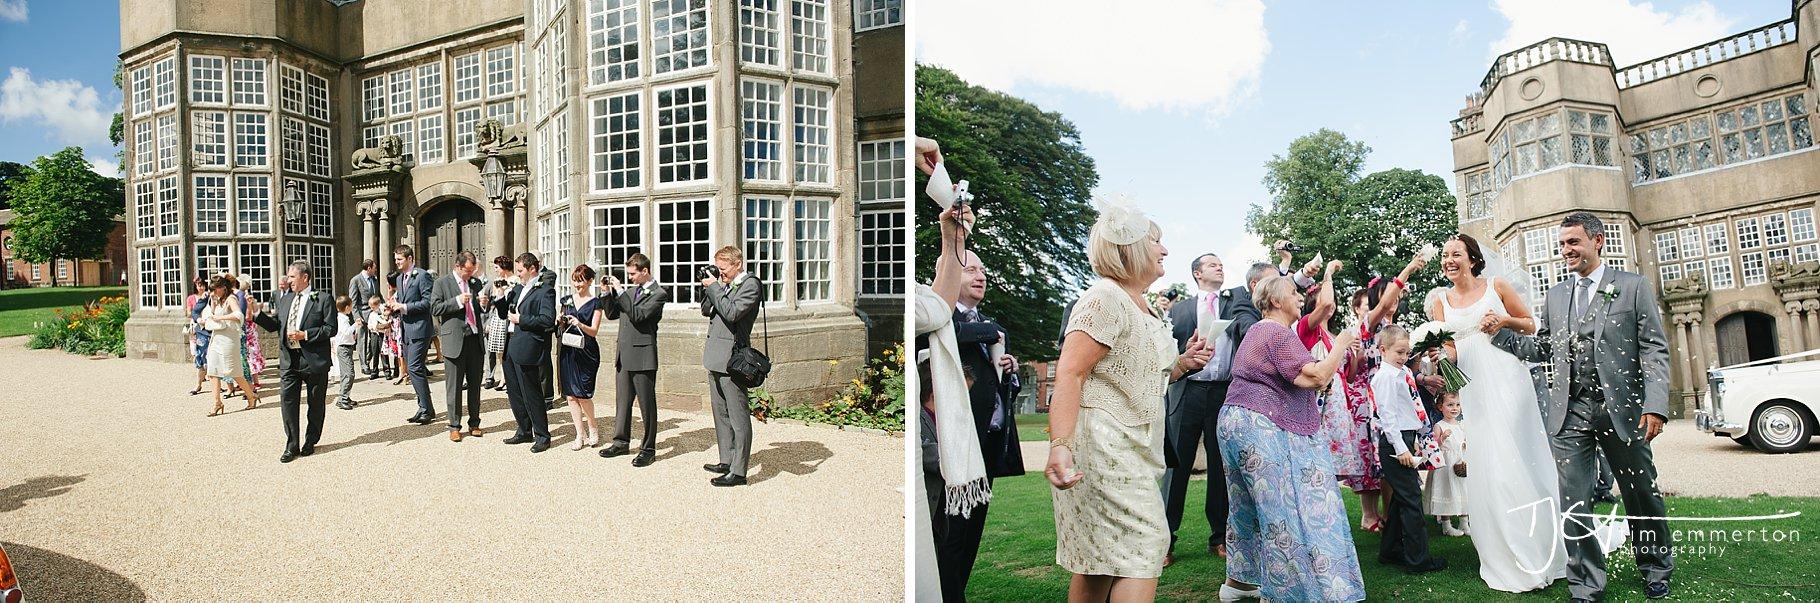 Northcote-Wedding-Photos-078.jpg